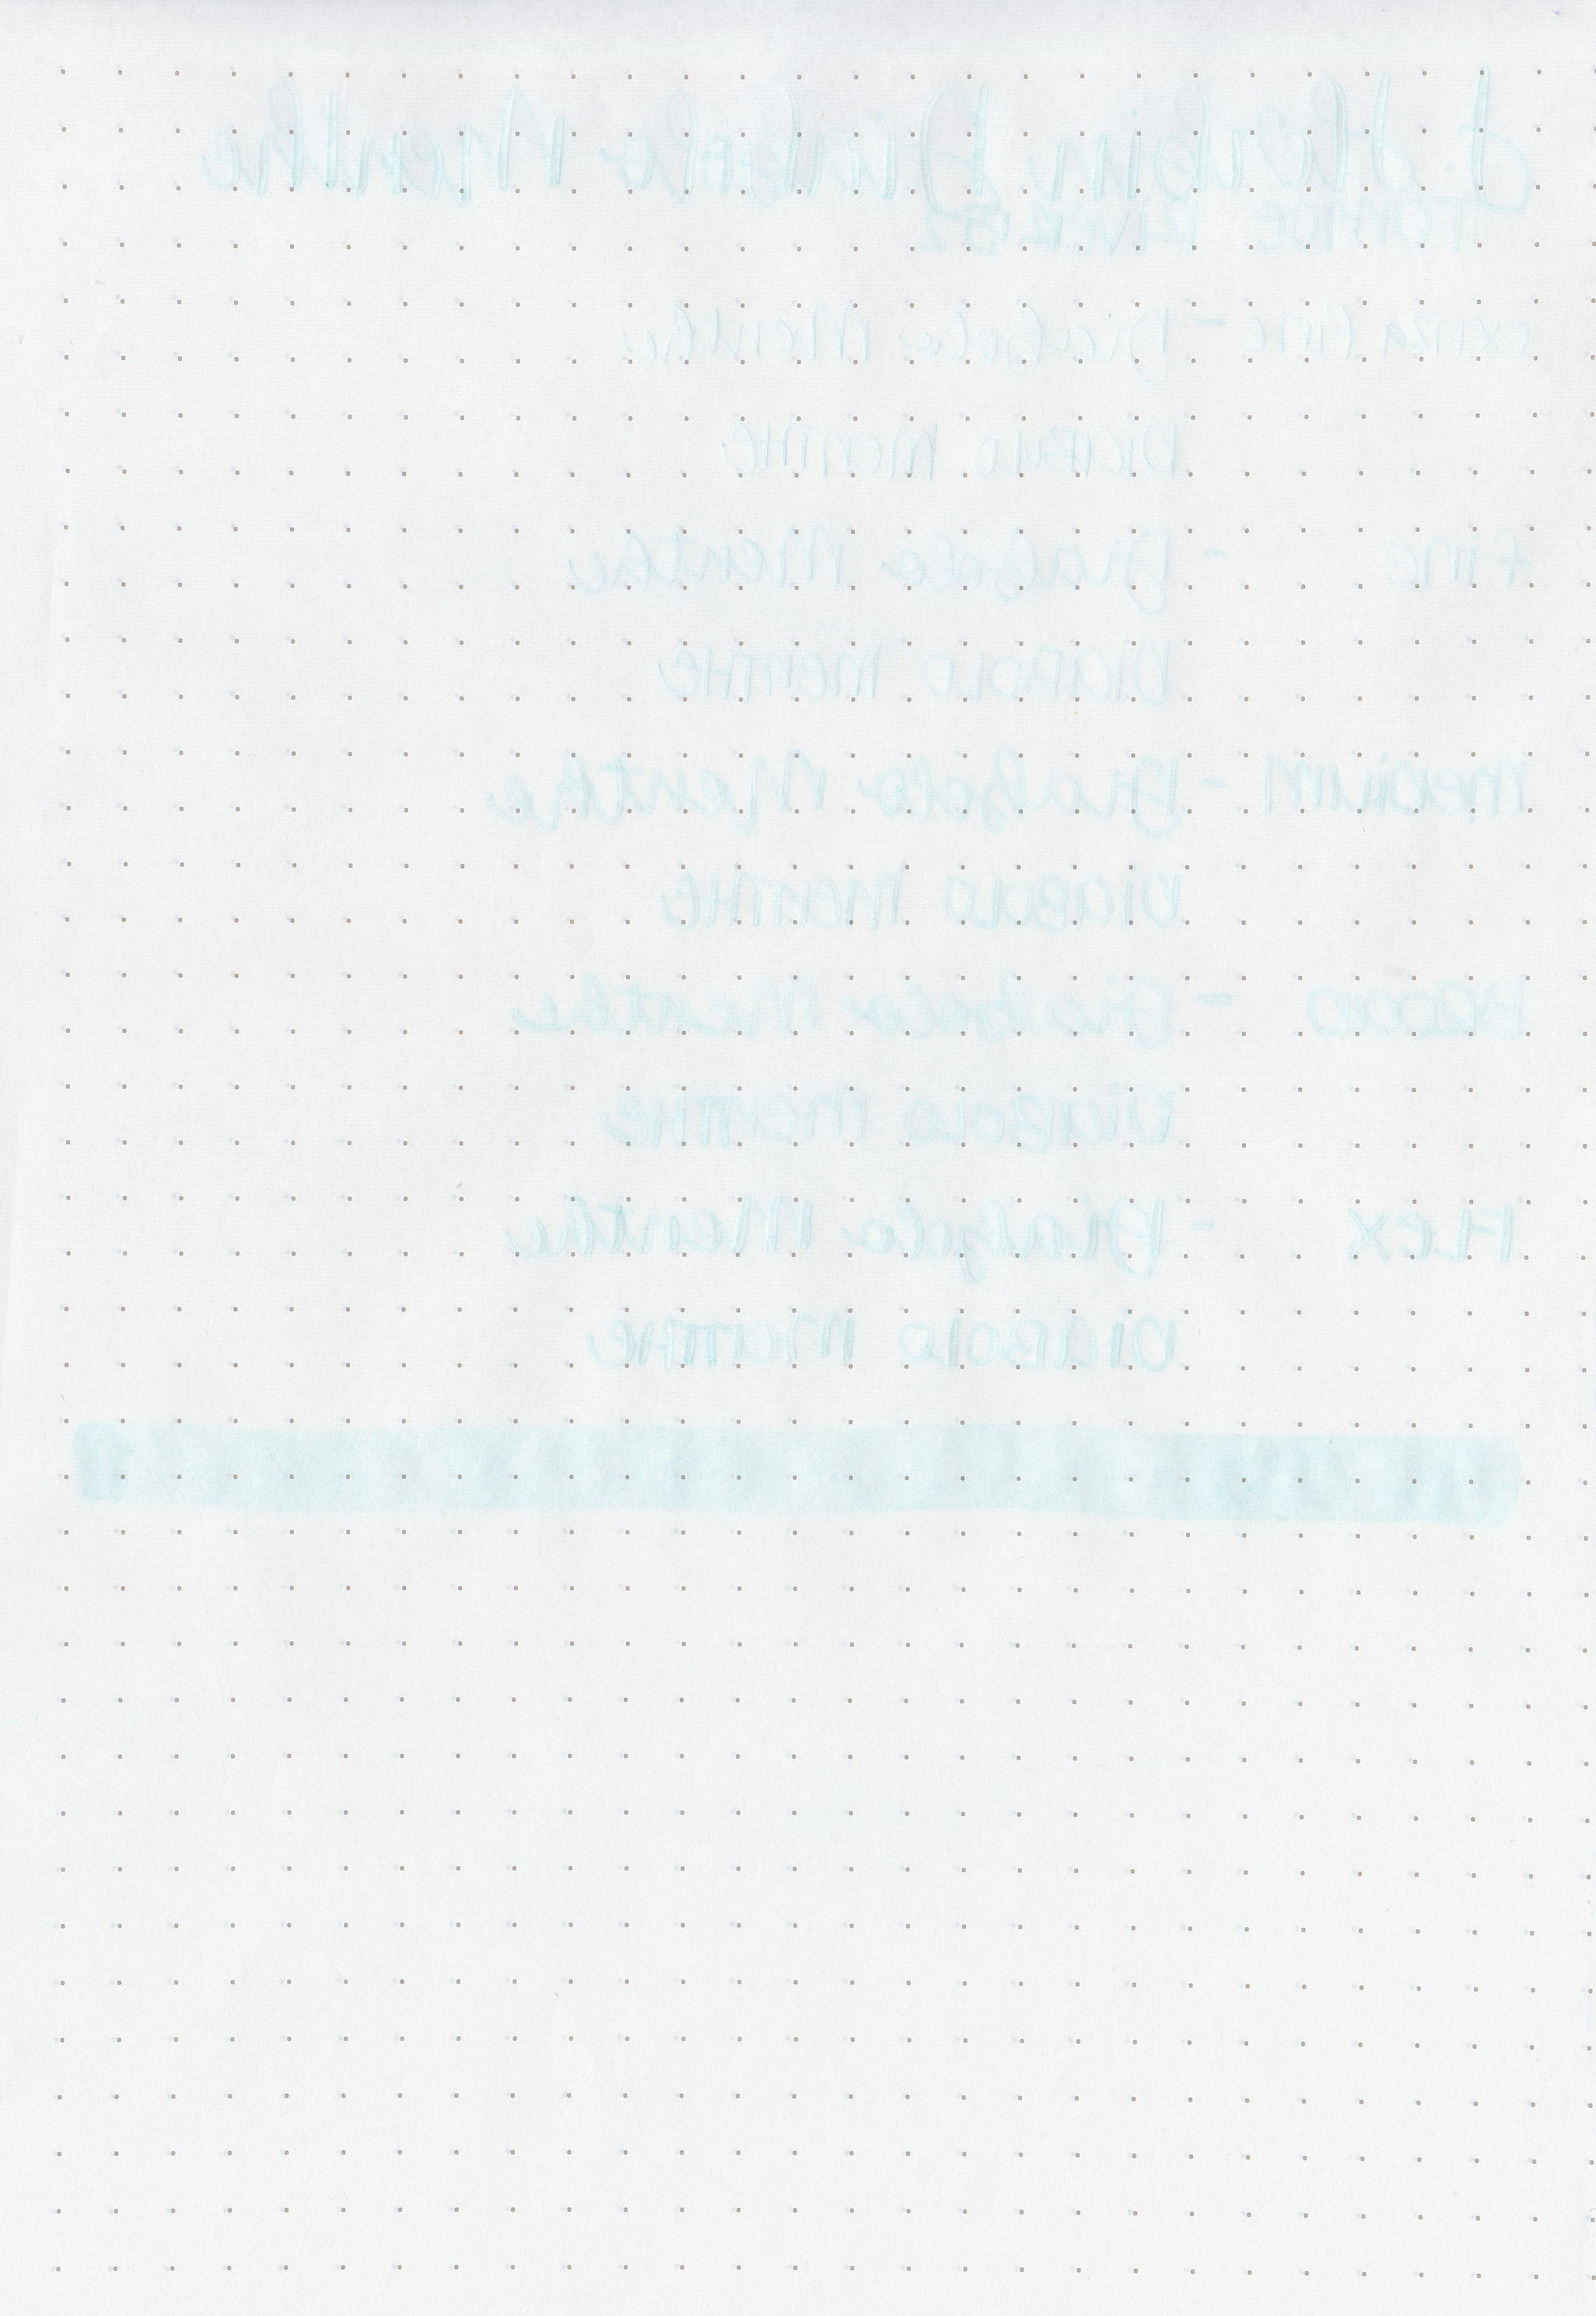 jh-diabolo-menthe-8.jpg